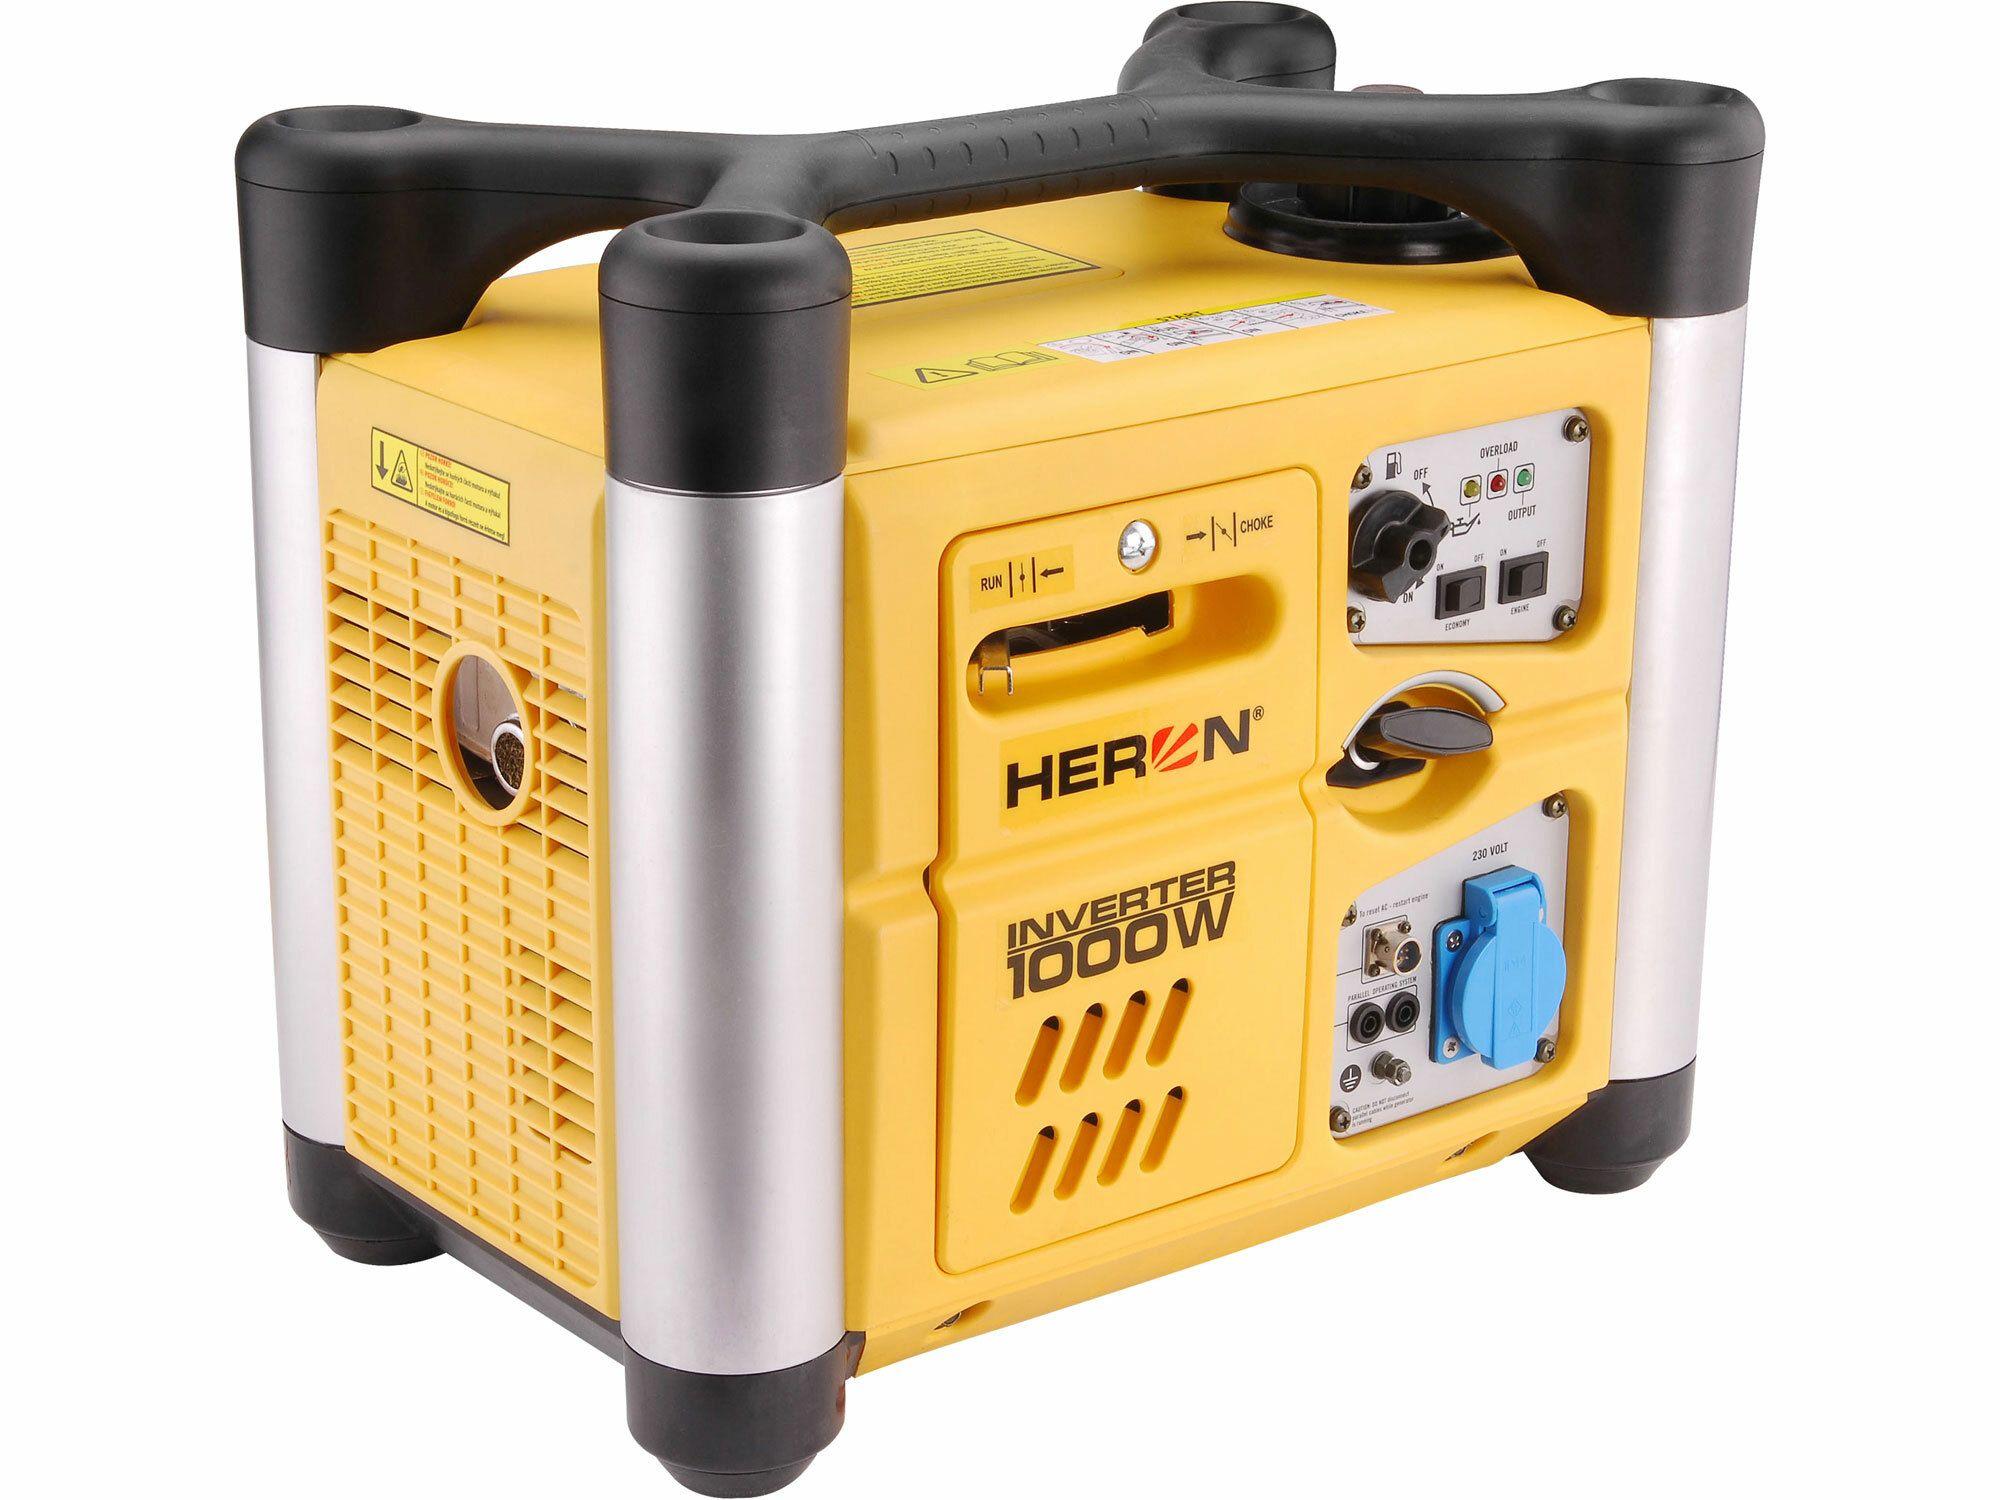 Elektrocentrála digitálna invertorová 2,0HP, 1,0kW, HERON, DGI 10 SP, 8896216